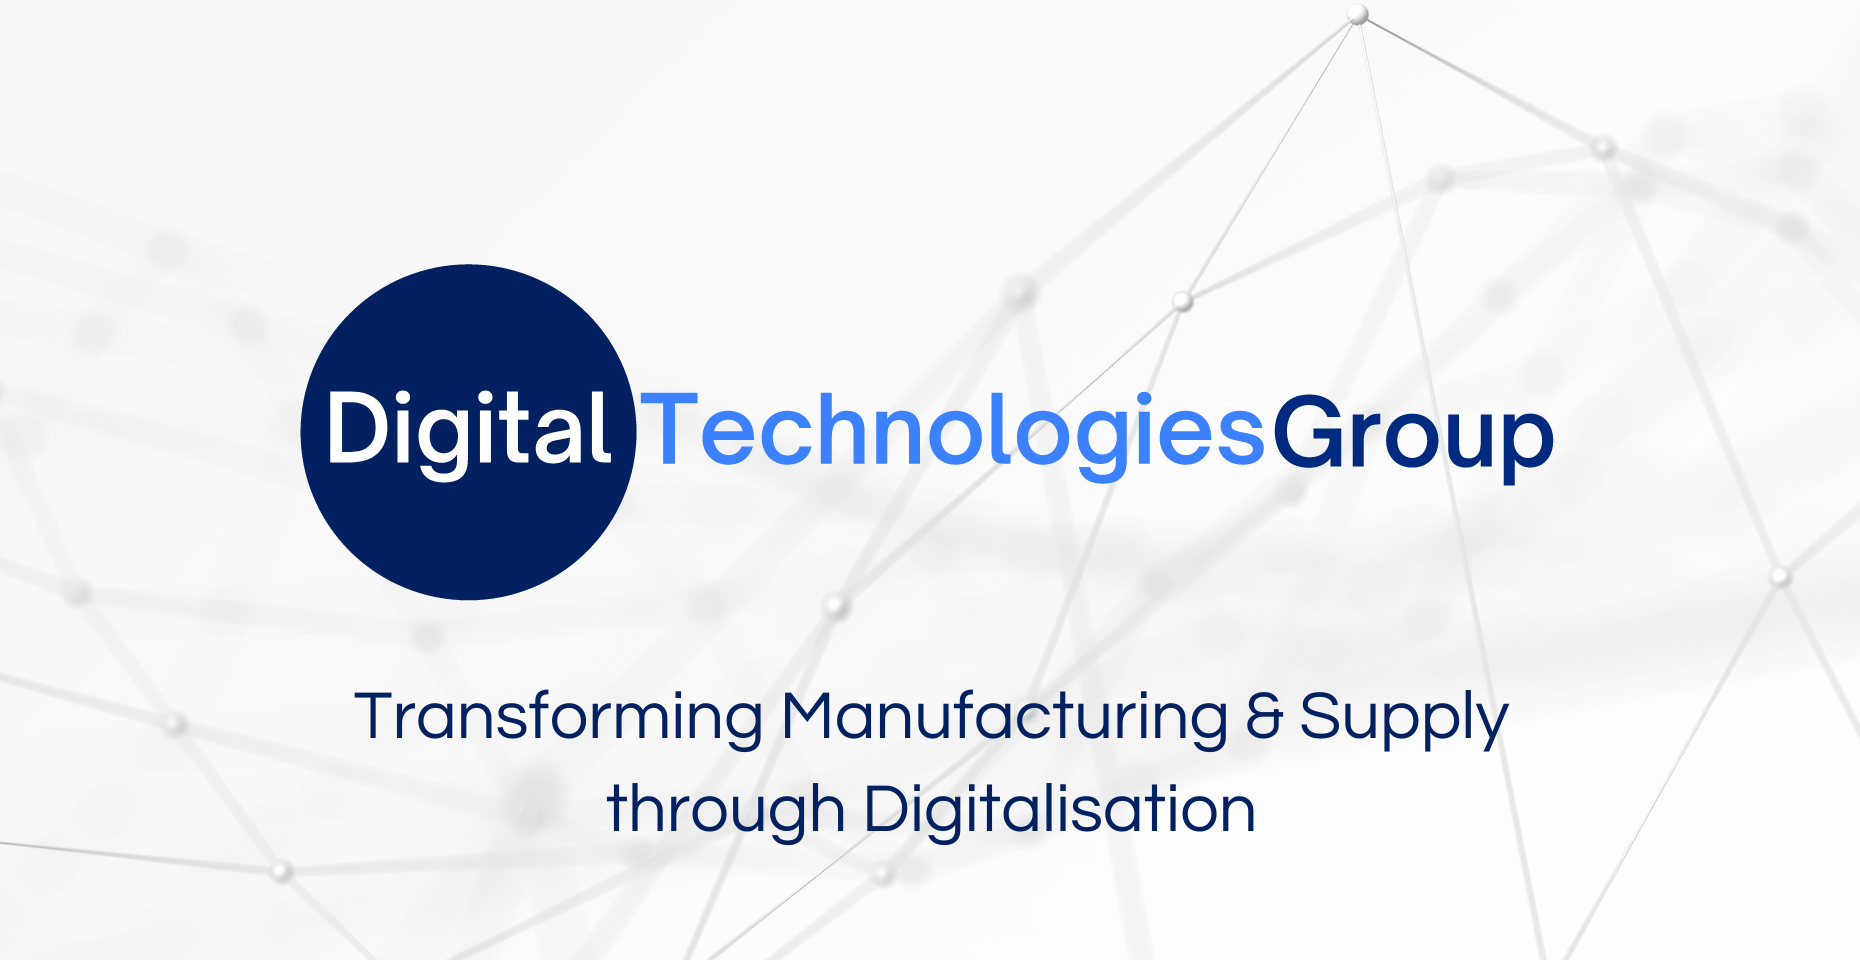 Digital Technologies Group